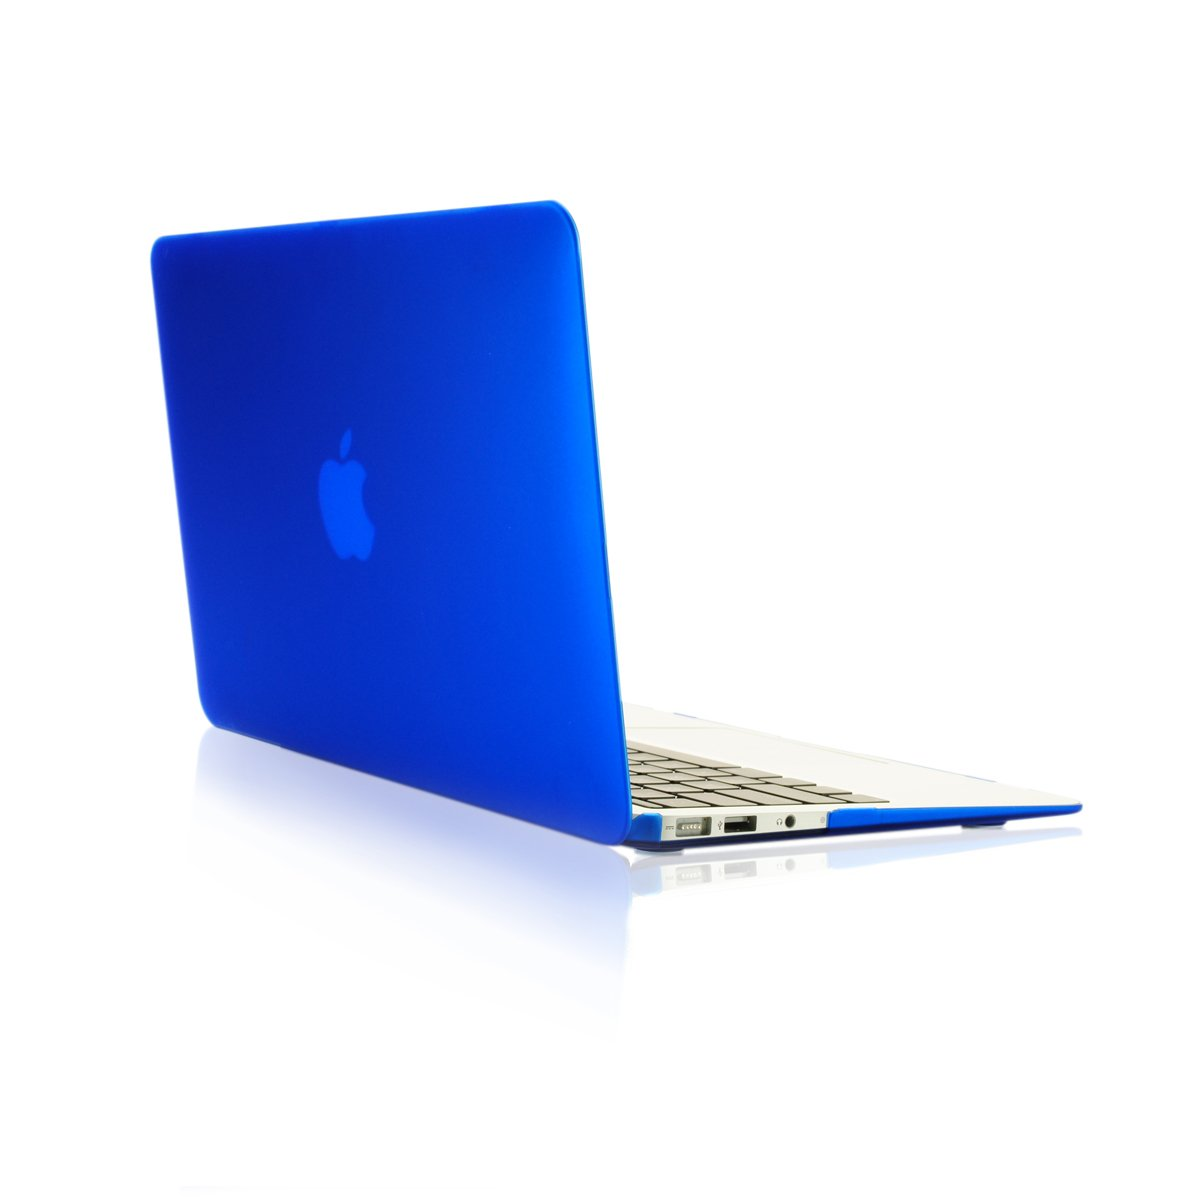 macbook air case 11-2708177